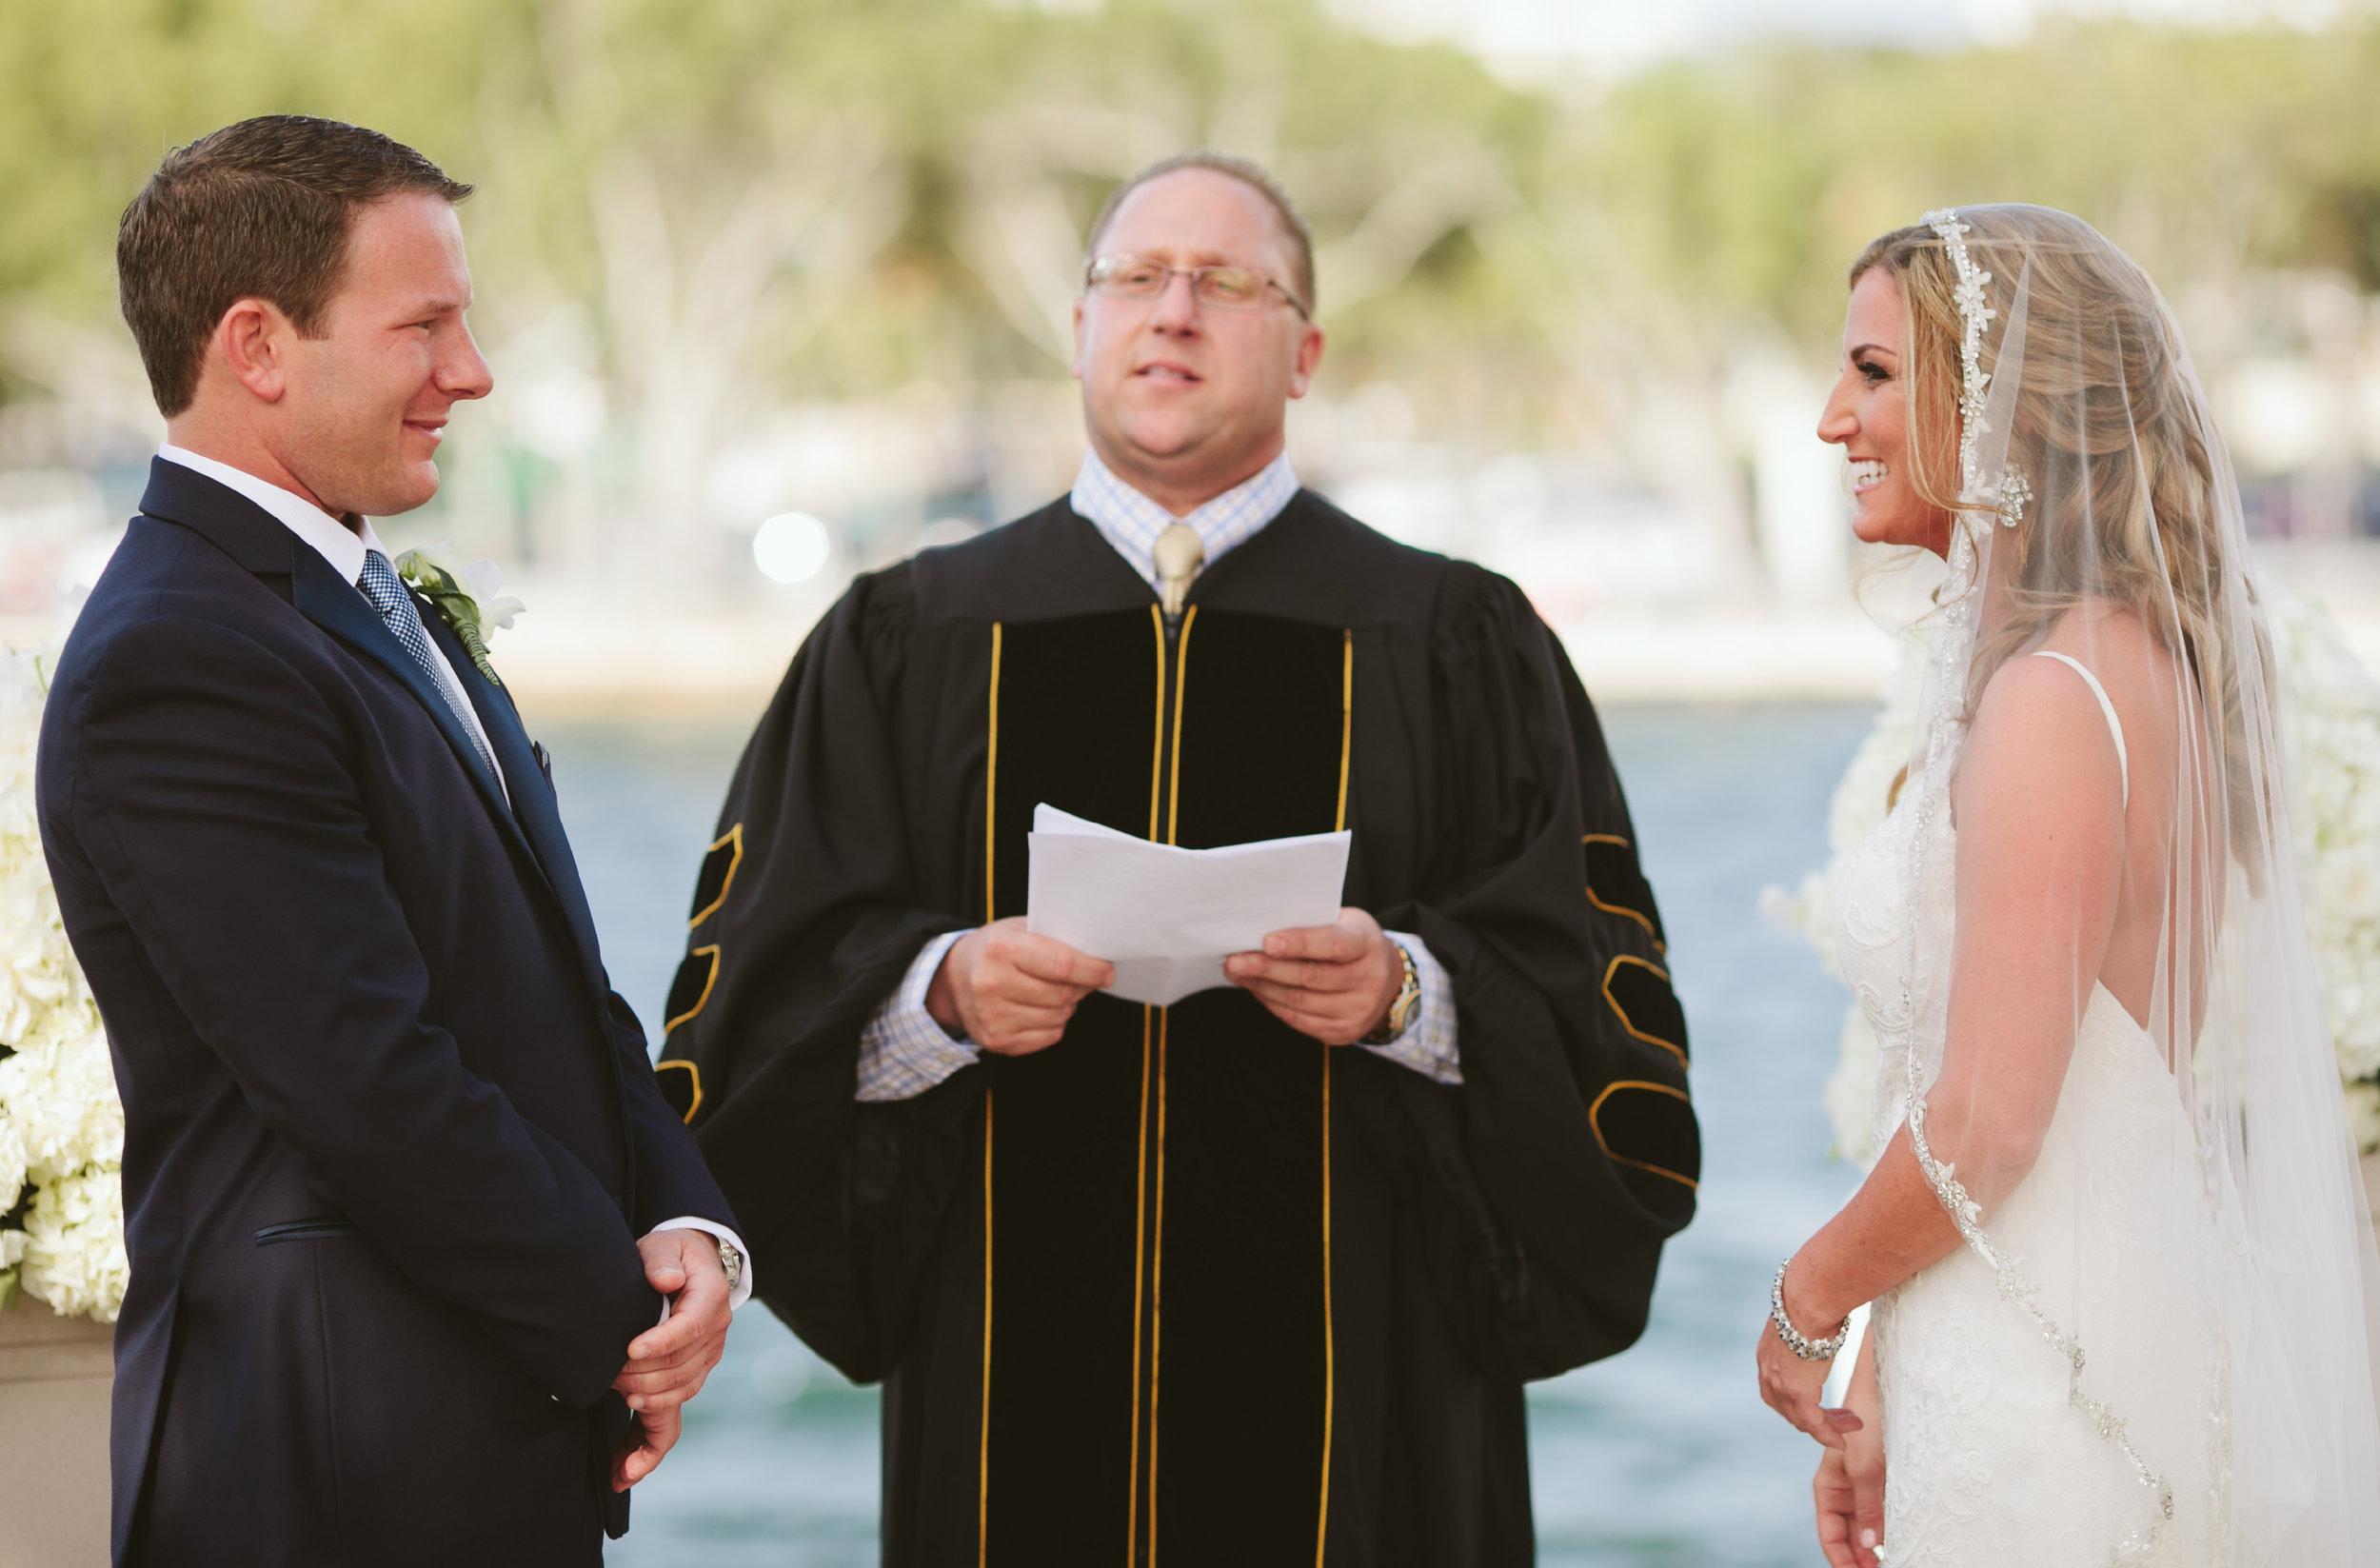 Kim + John's Wedding at the Waterstone Hotel in Boca Raton49.jpg